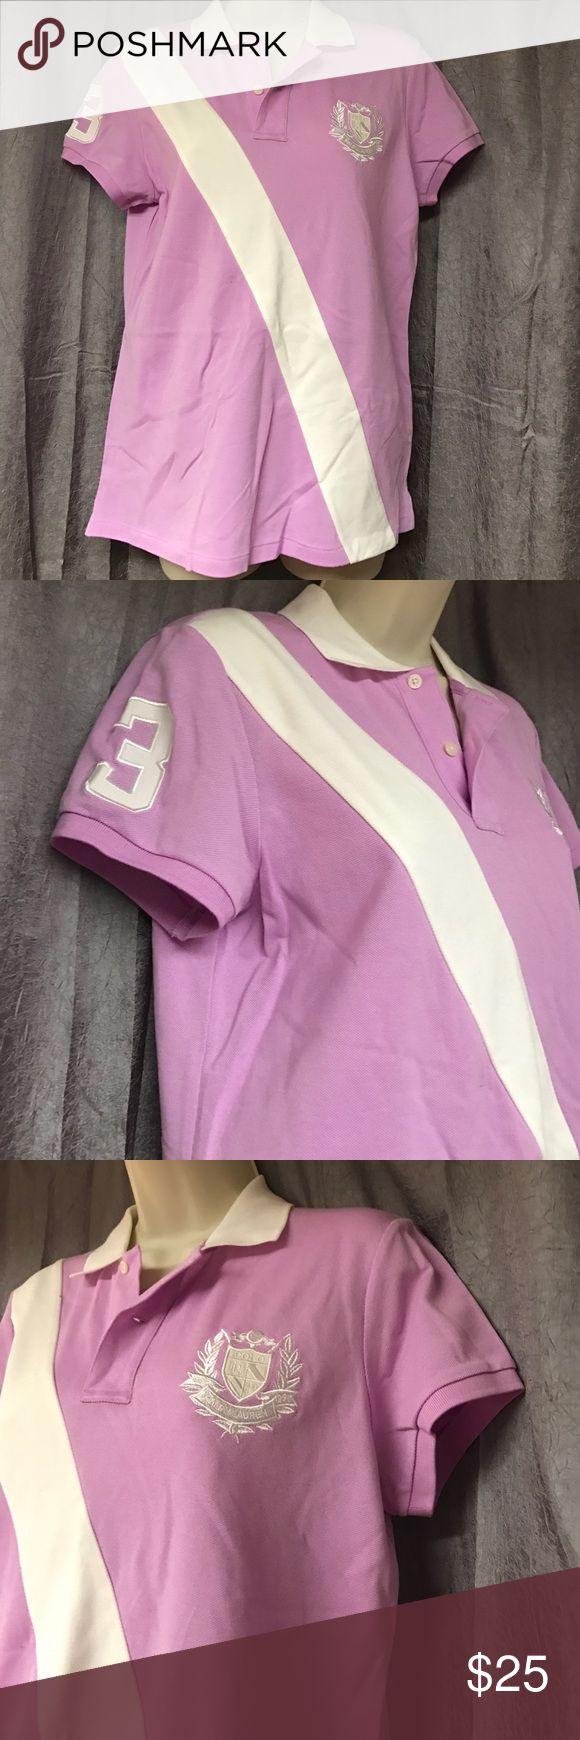 NWT RALPH Lauren Golf Polo shirt lavender Sz L🌸 New with tags Lavender and white Ralph Lauren Golf polo style shirt fits 12/14 $95 new Ralph Lauren Tops Tees - Short Sleeve